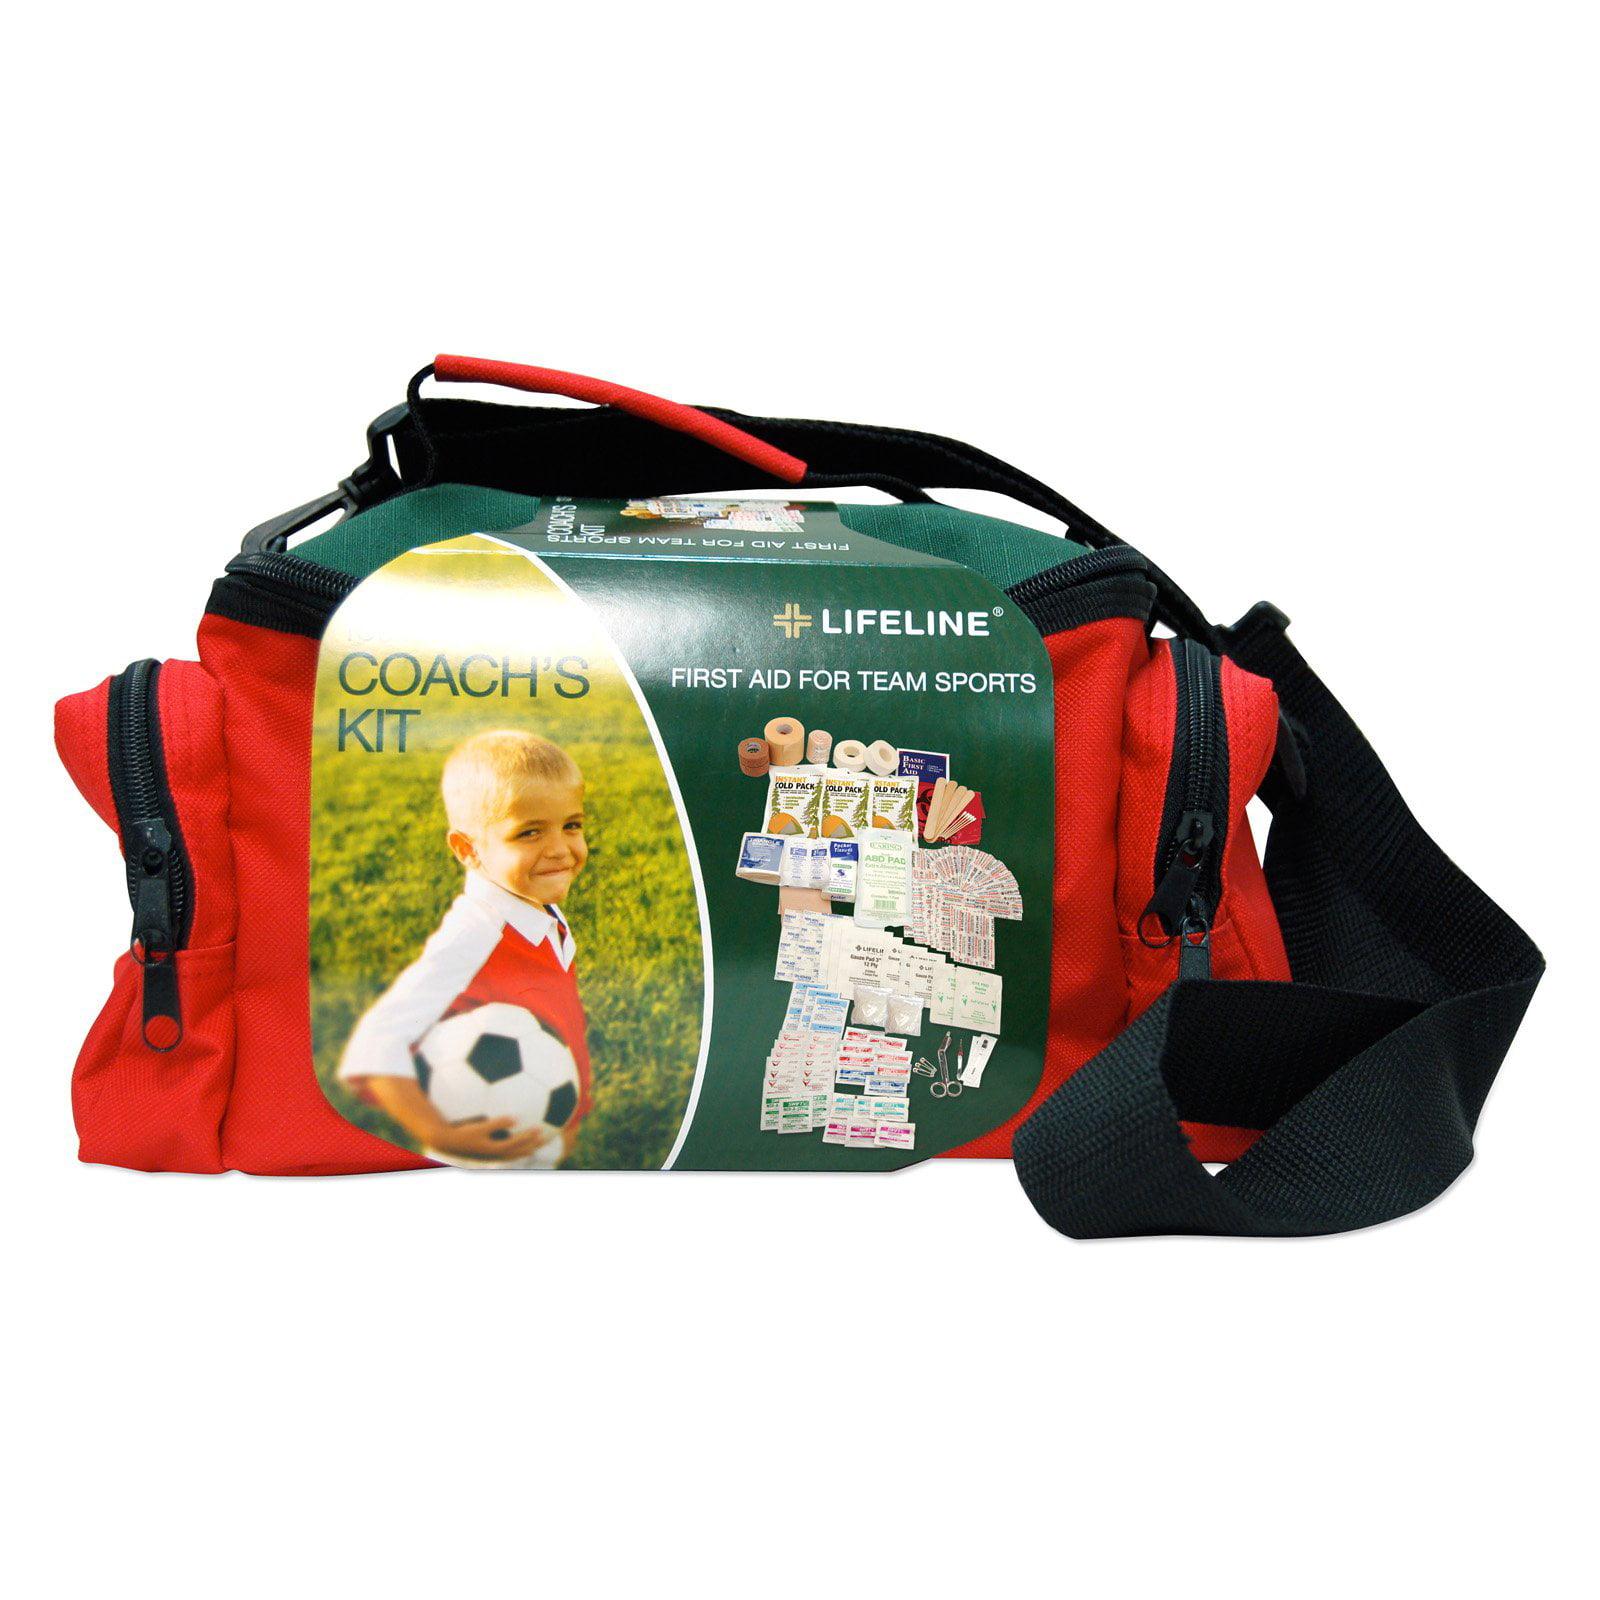 Lifeline Team Sports Coach First Aid Kit 133 Pieces by Lifeline First Aid Llc